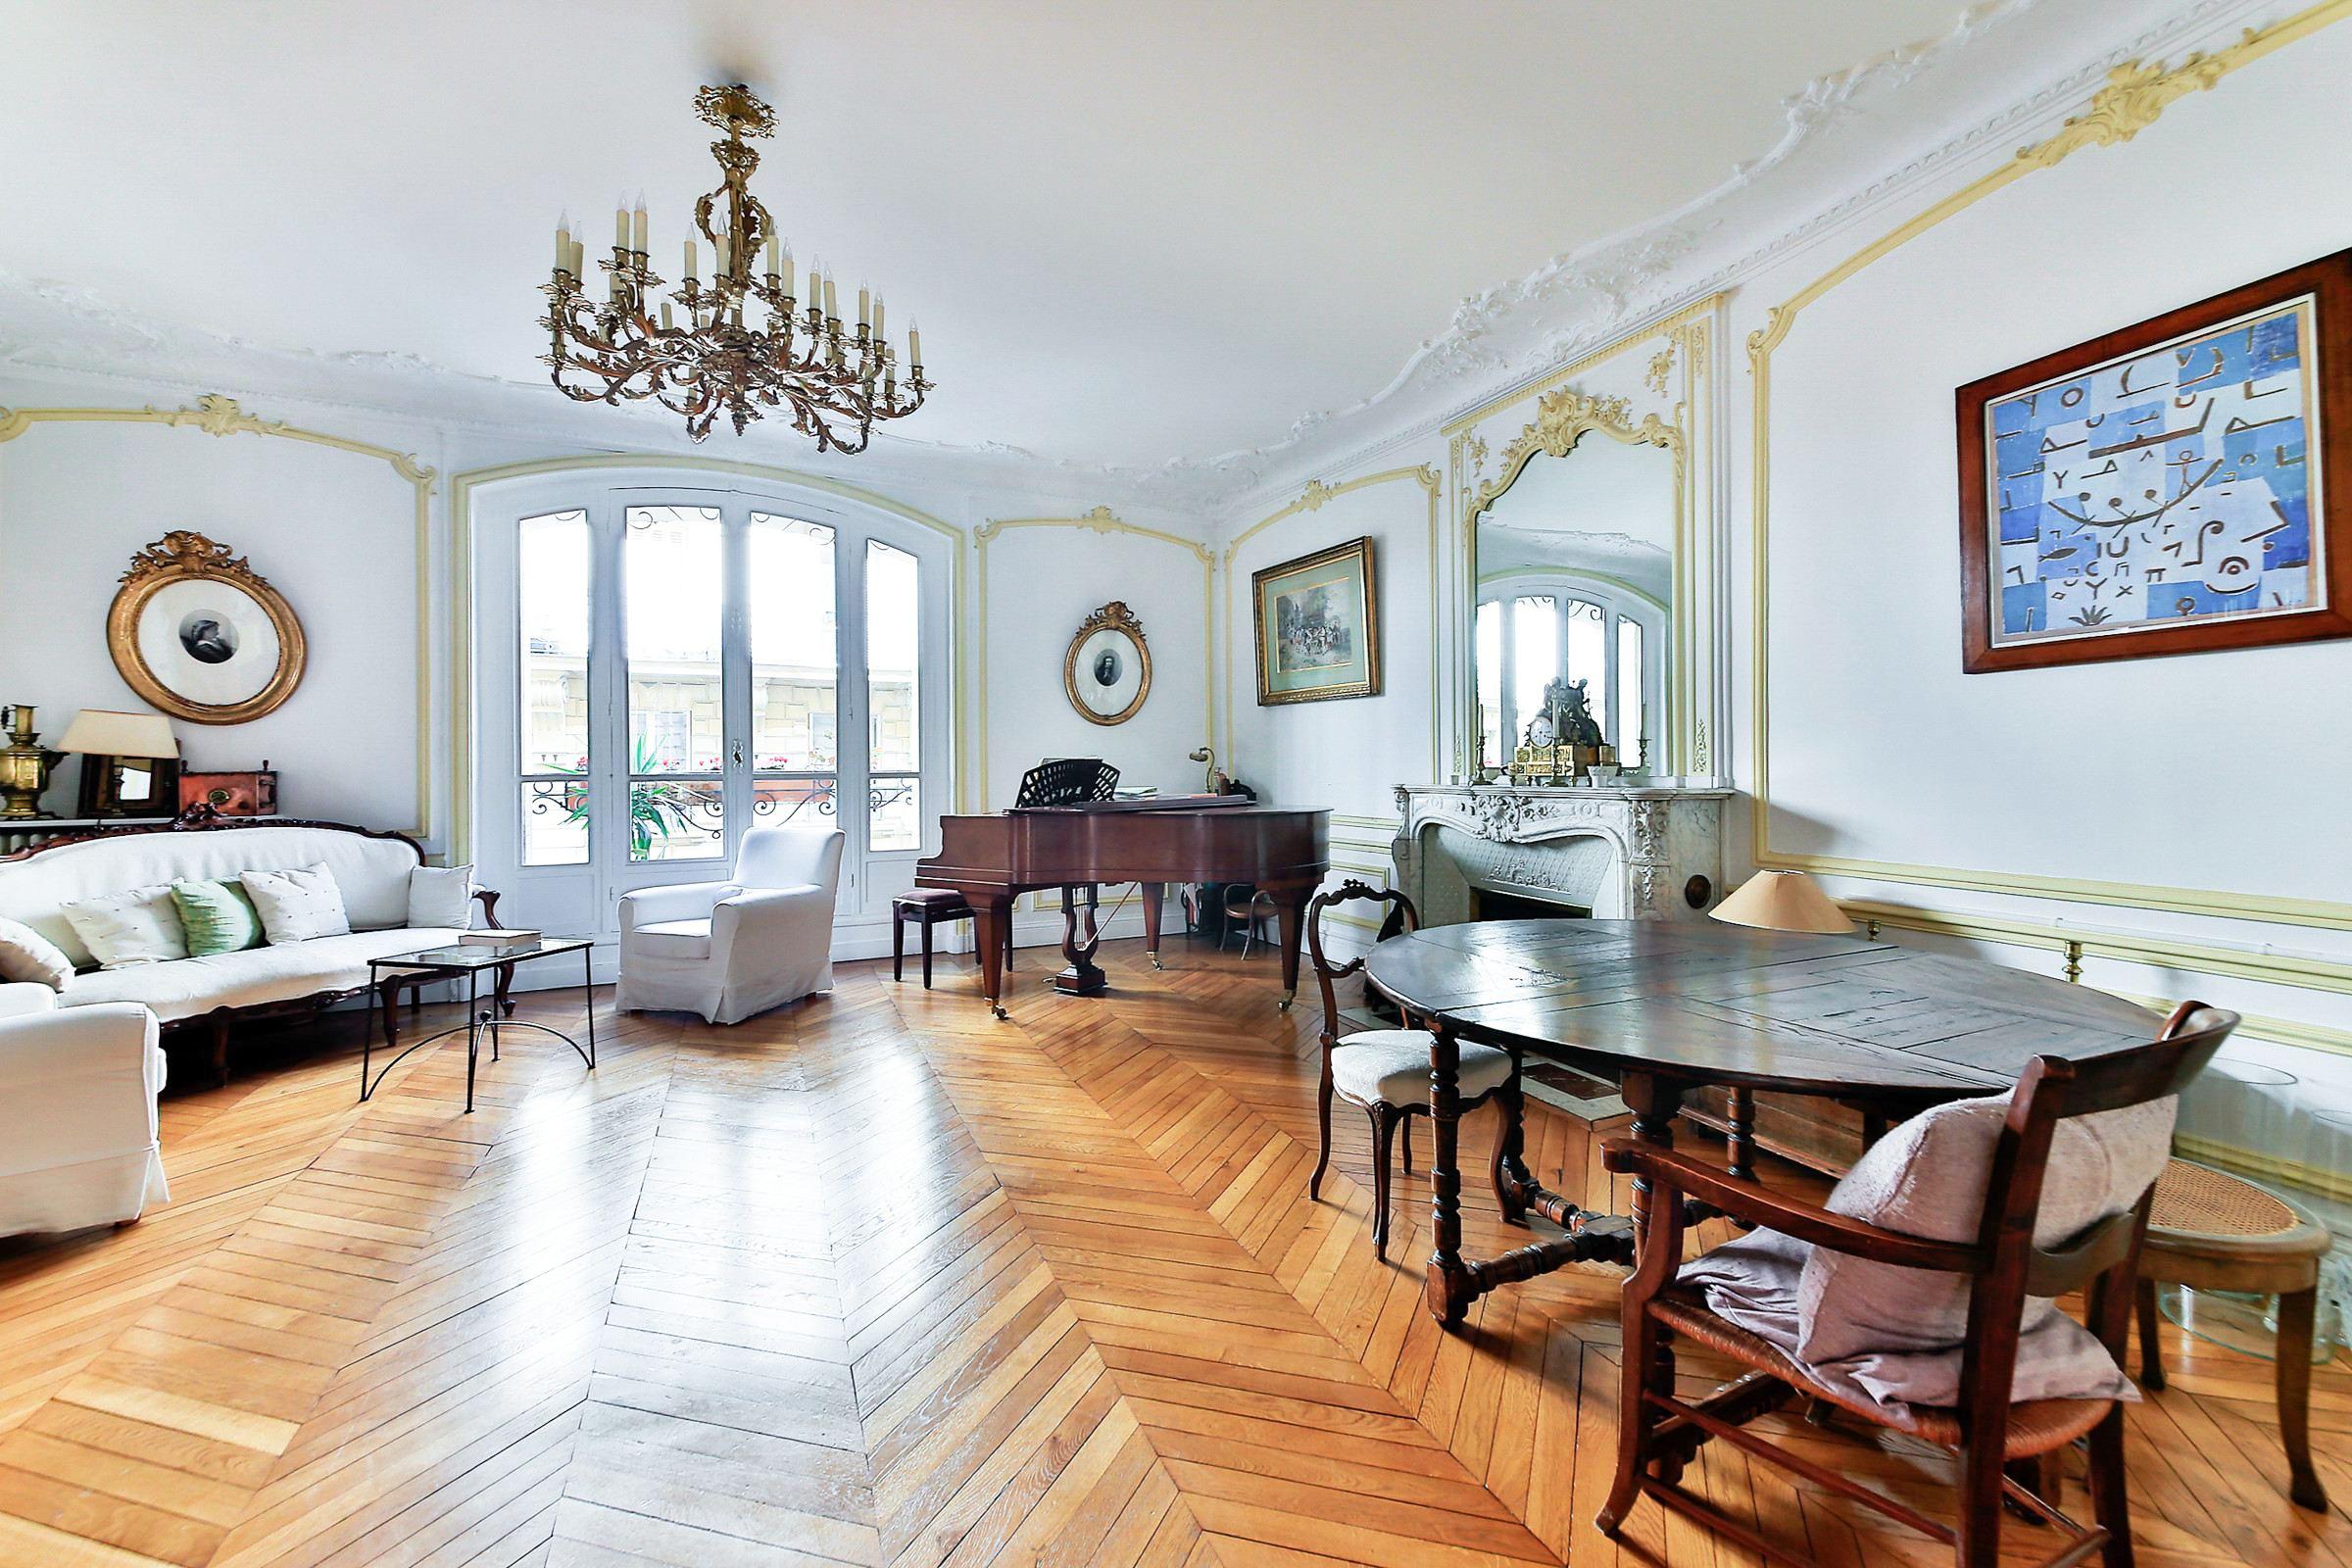 Appartamento per Vendita alle ore Paris 8 - Villiers. Apartment. Perfect layout Paris, Parigi, 75008 Francia